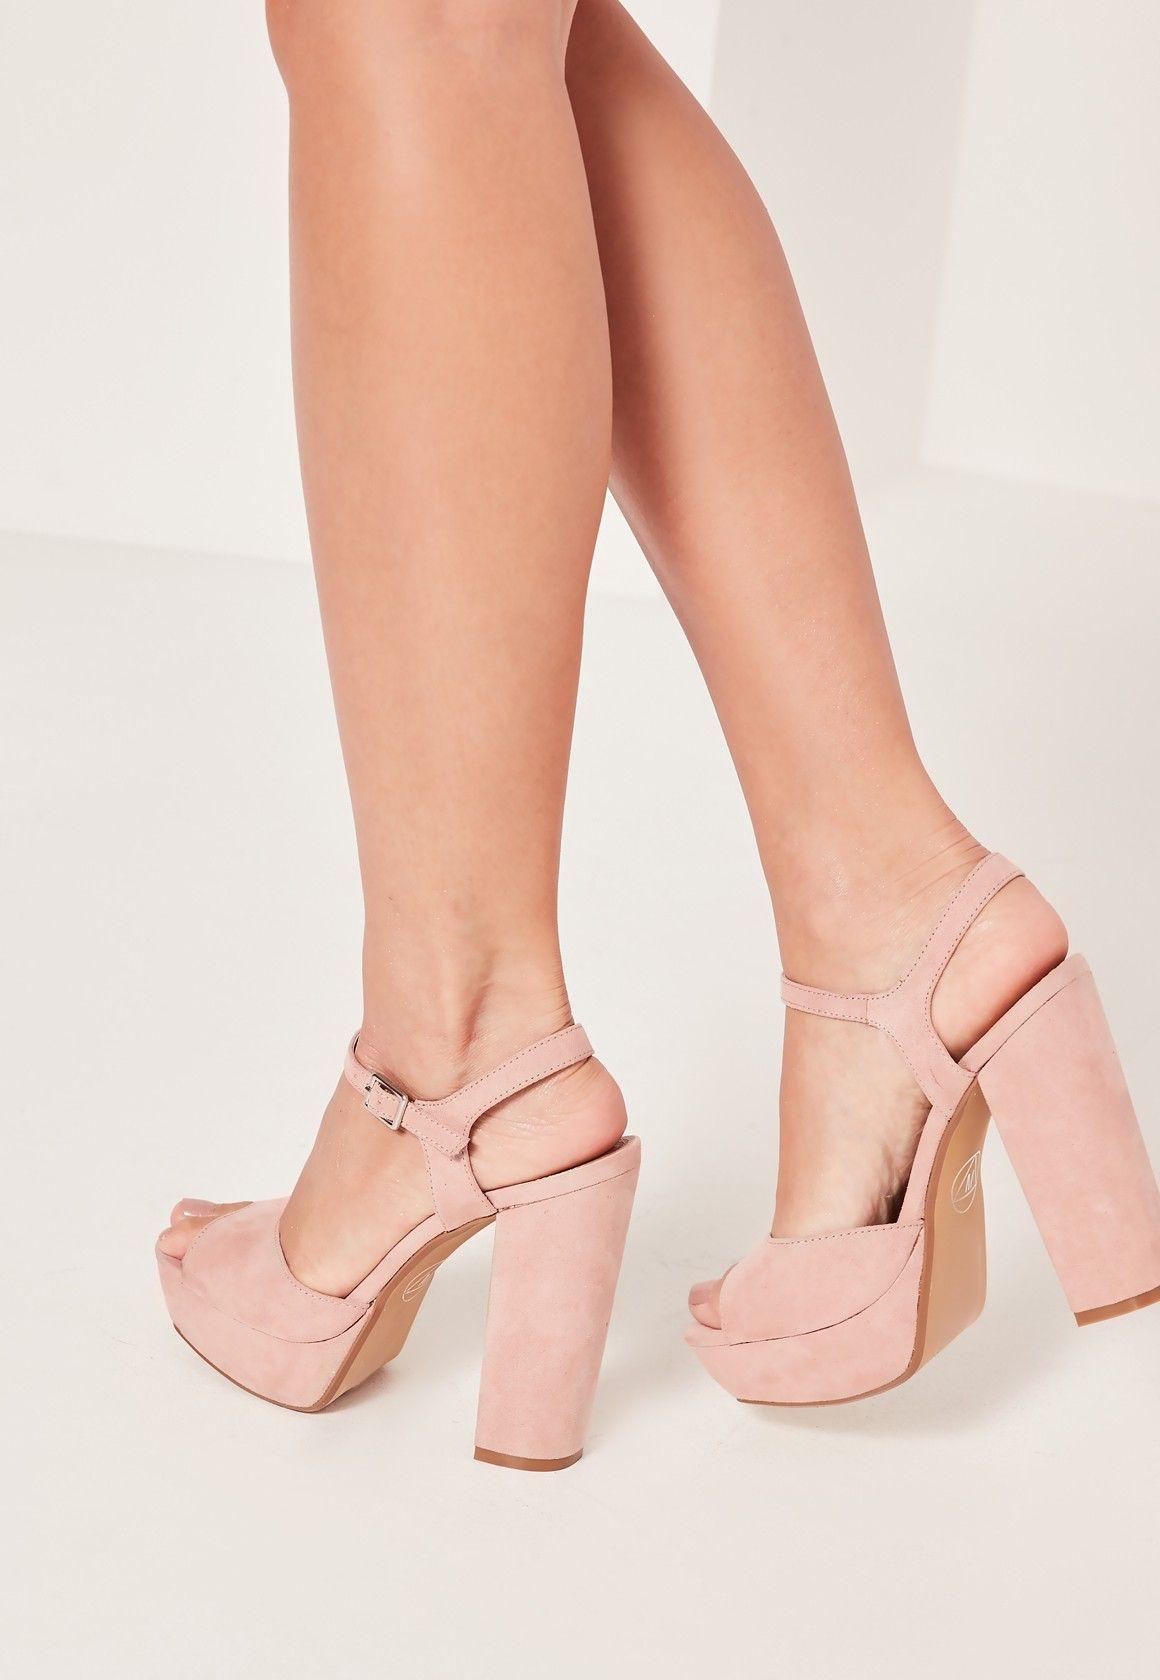 blush pink strappy sandals online store